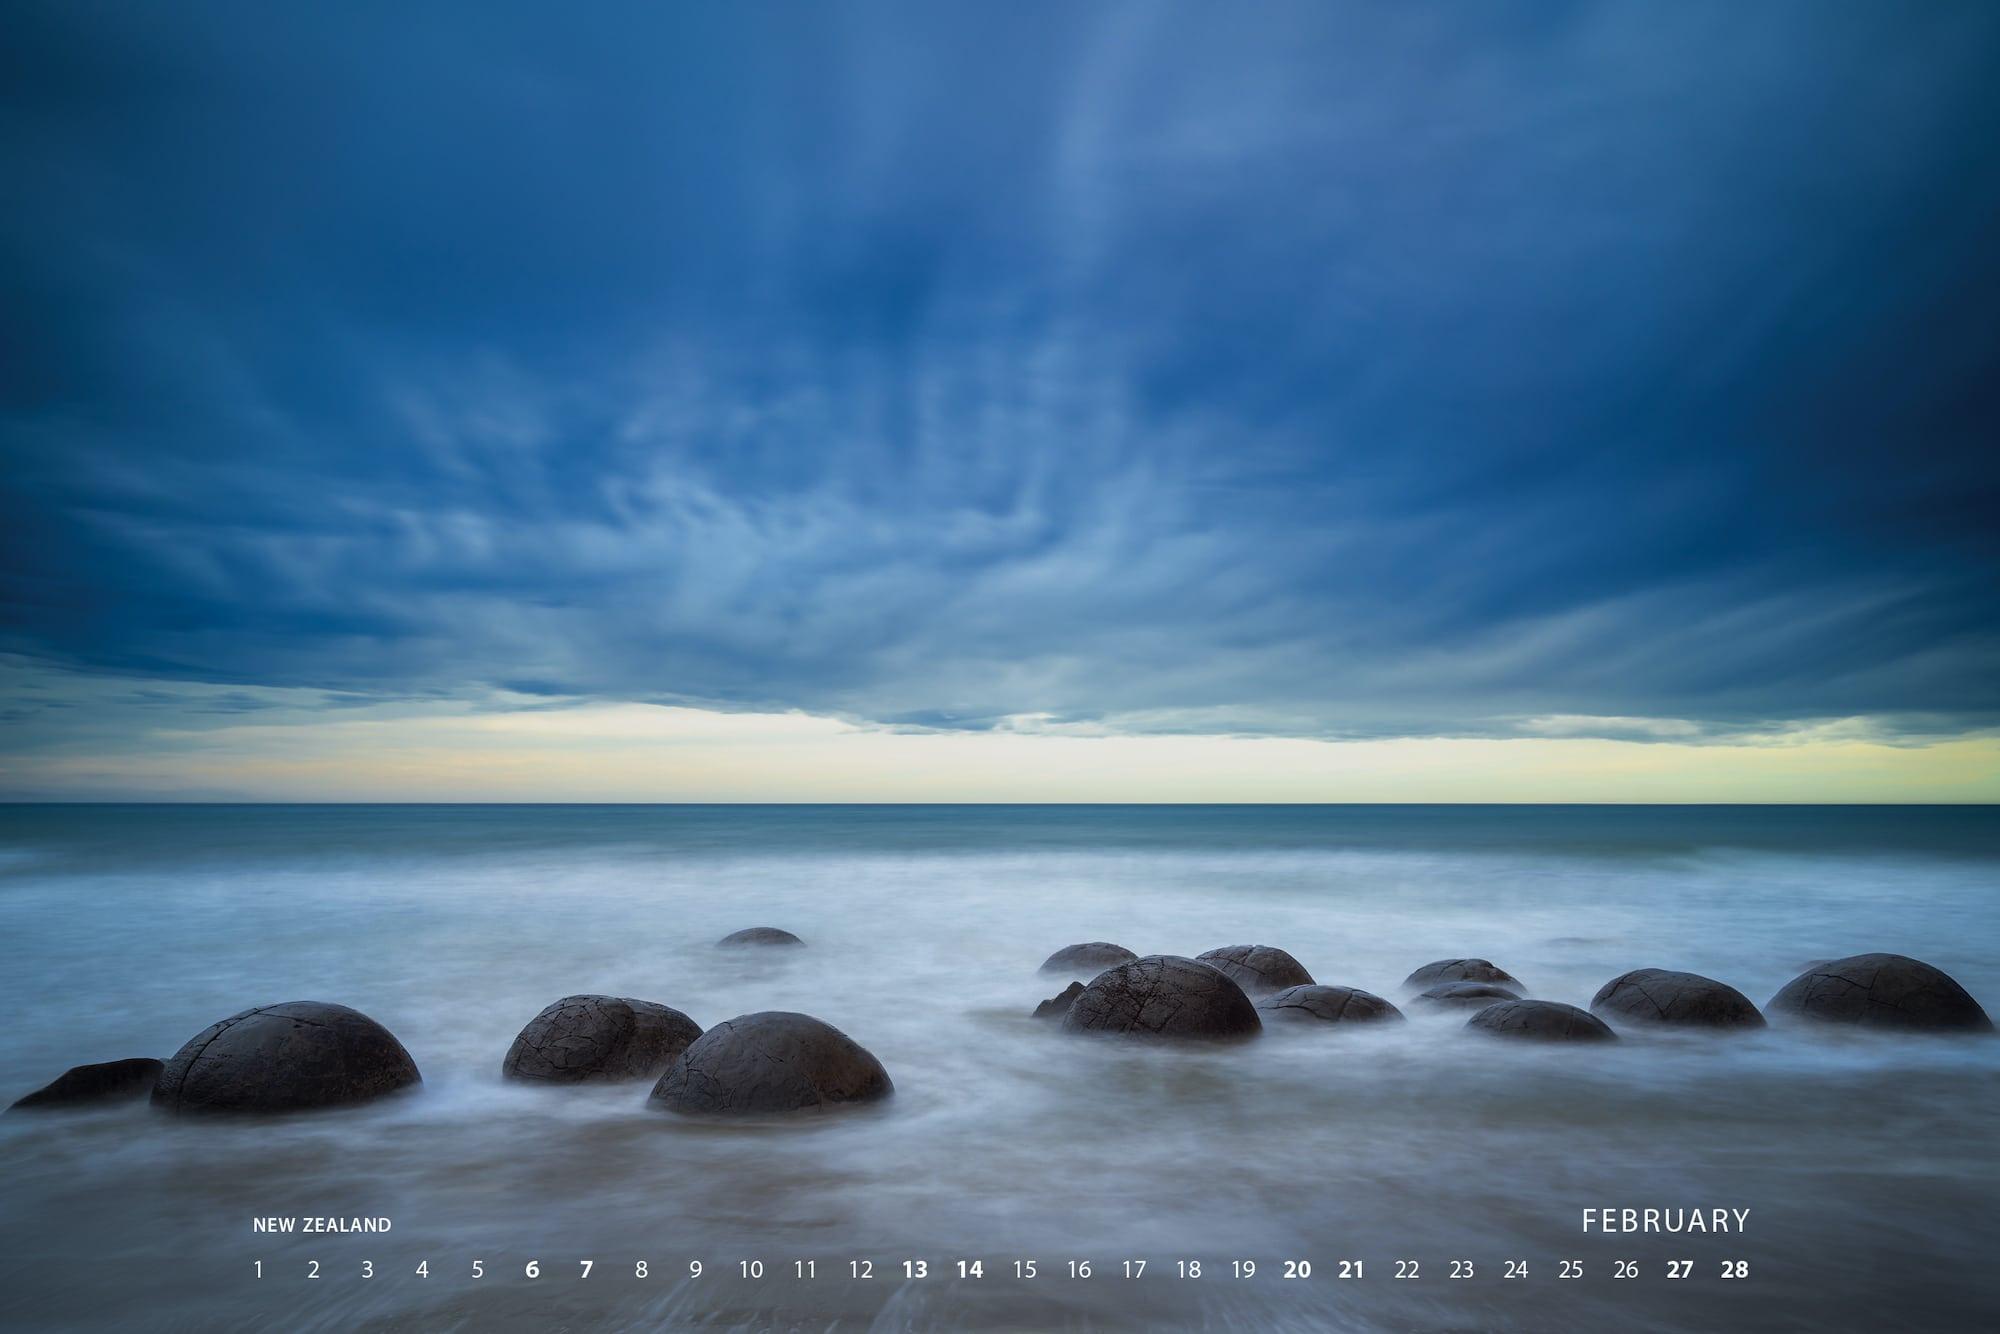 Calendar 2021 - February